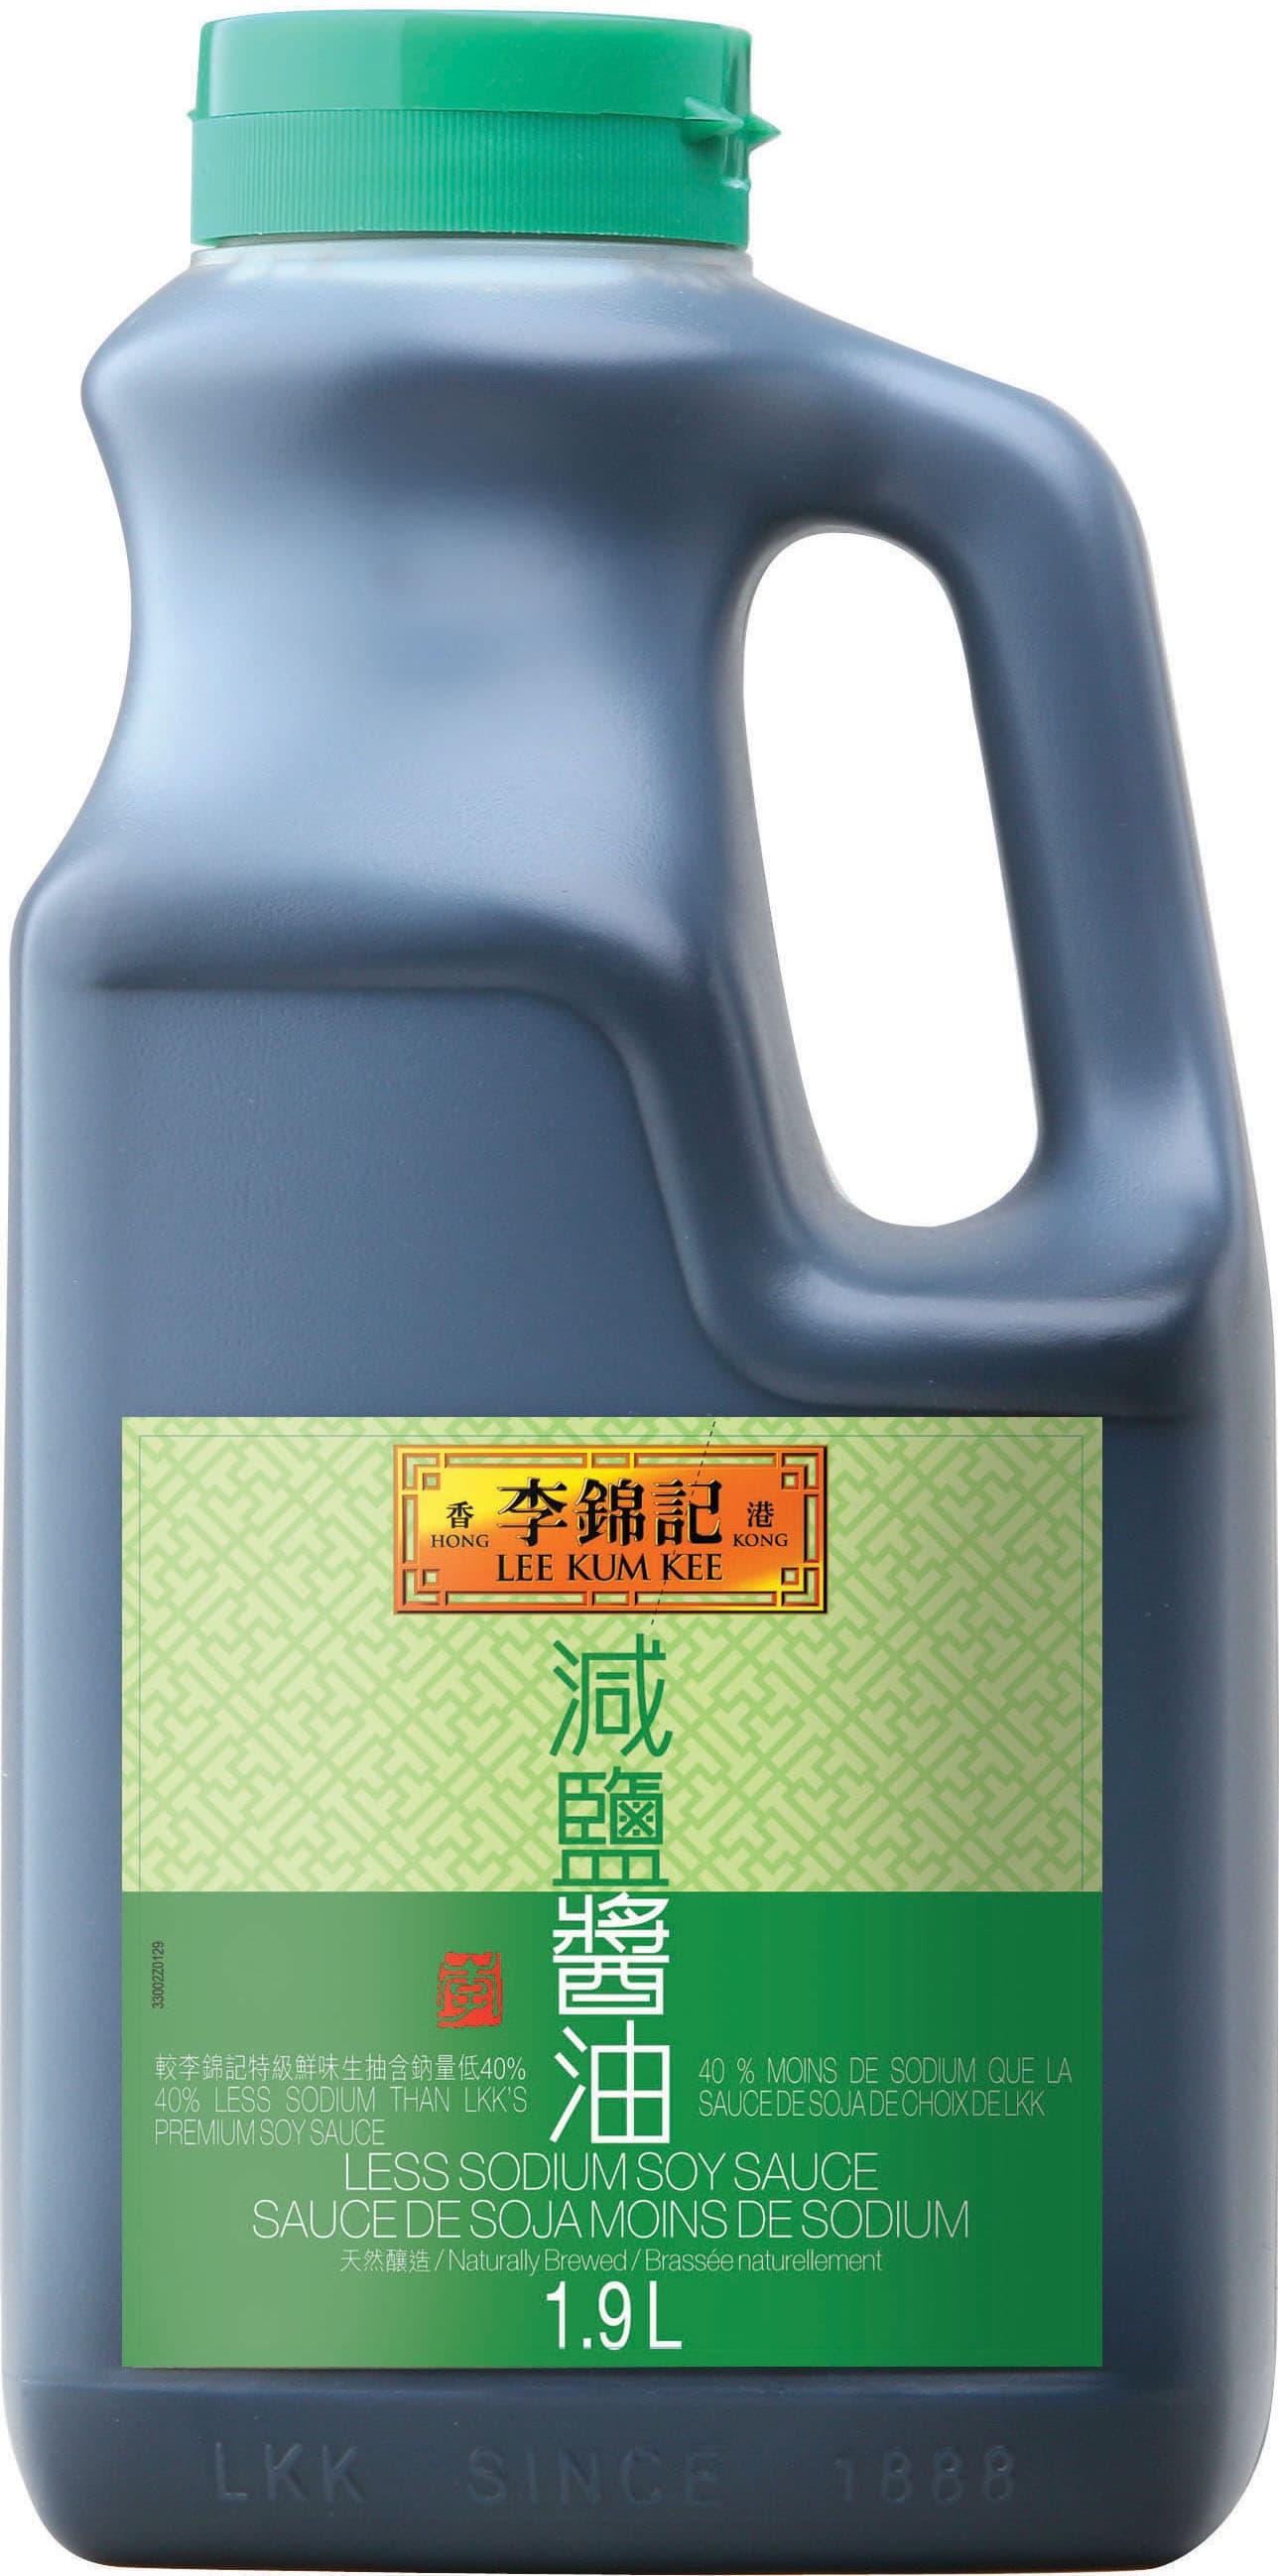 Less Sodium Soy Sauce Lee Kum Kee Professional Us Usa